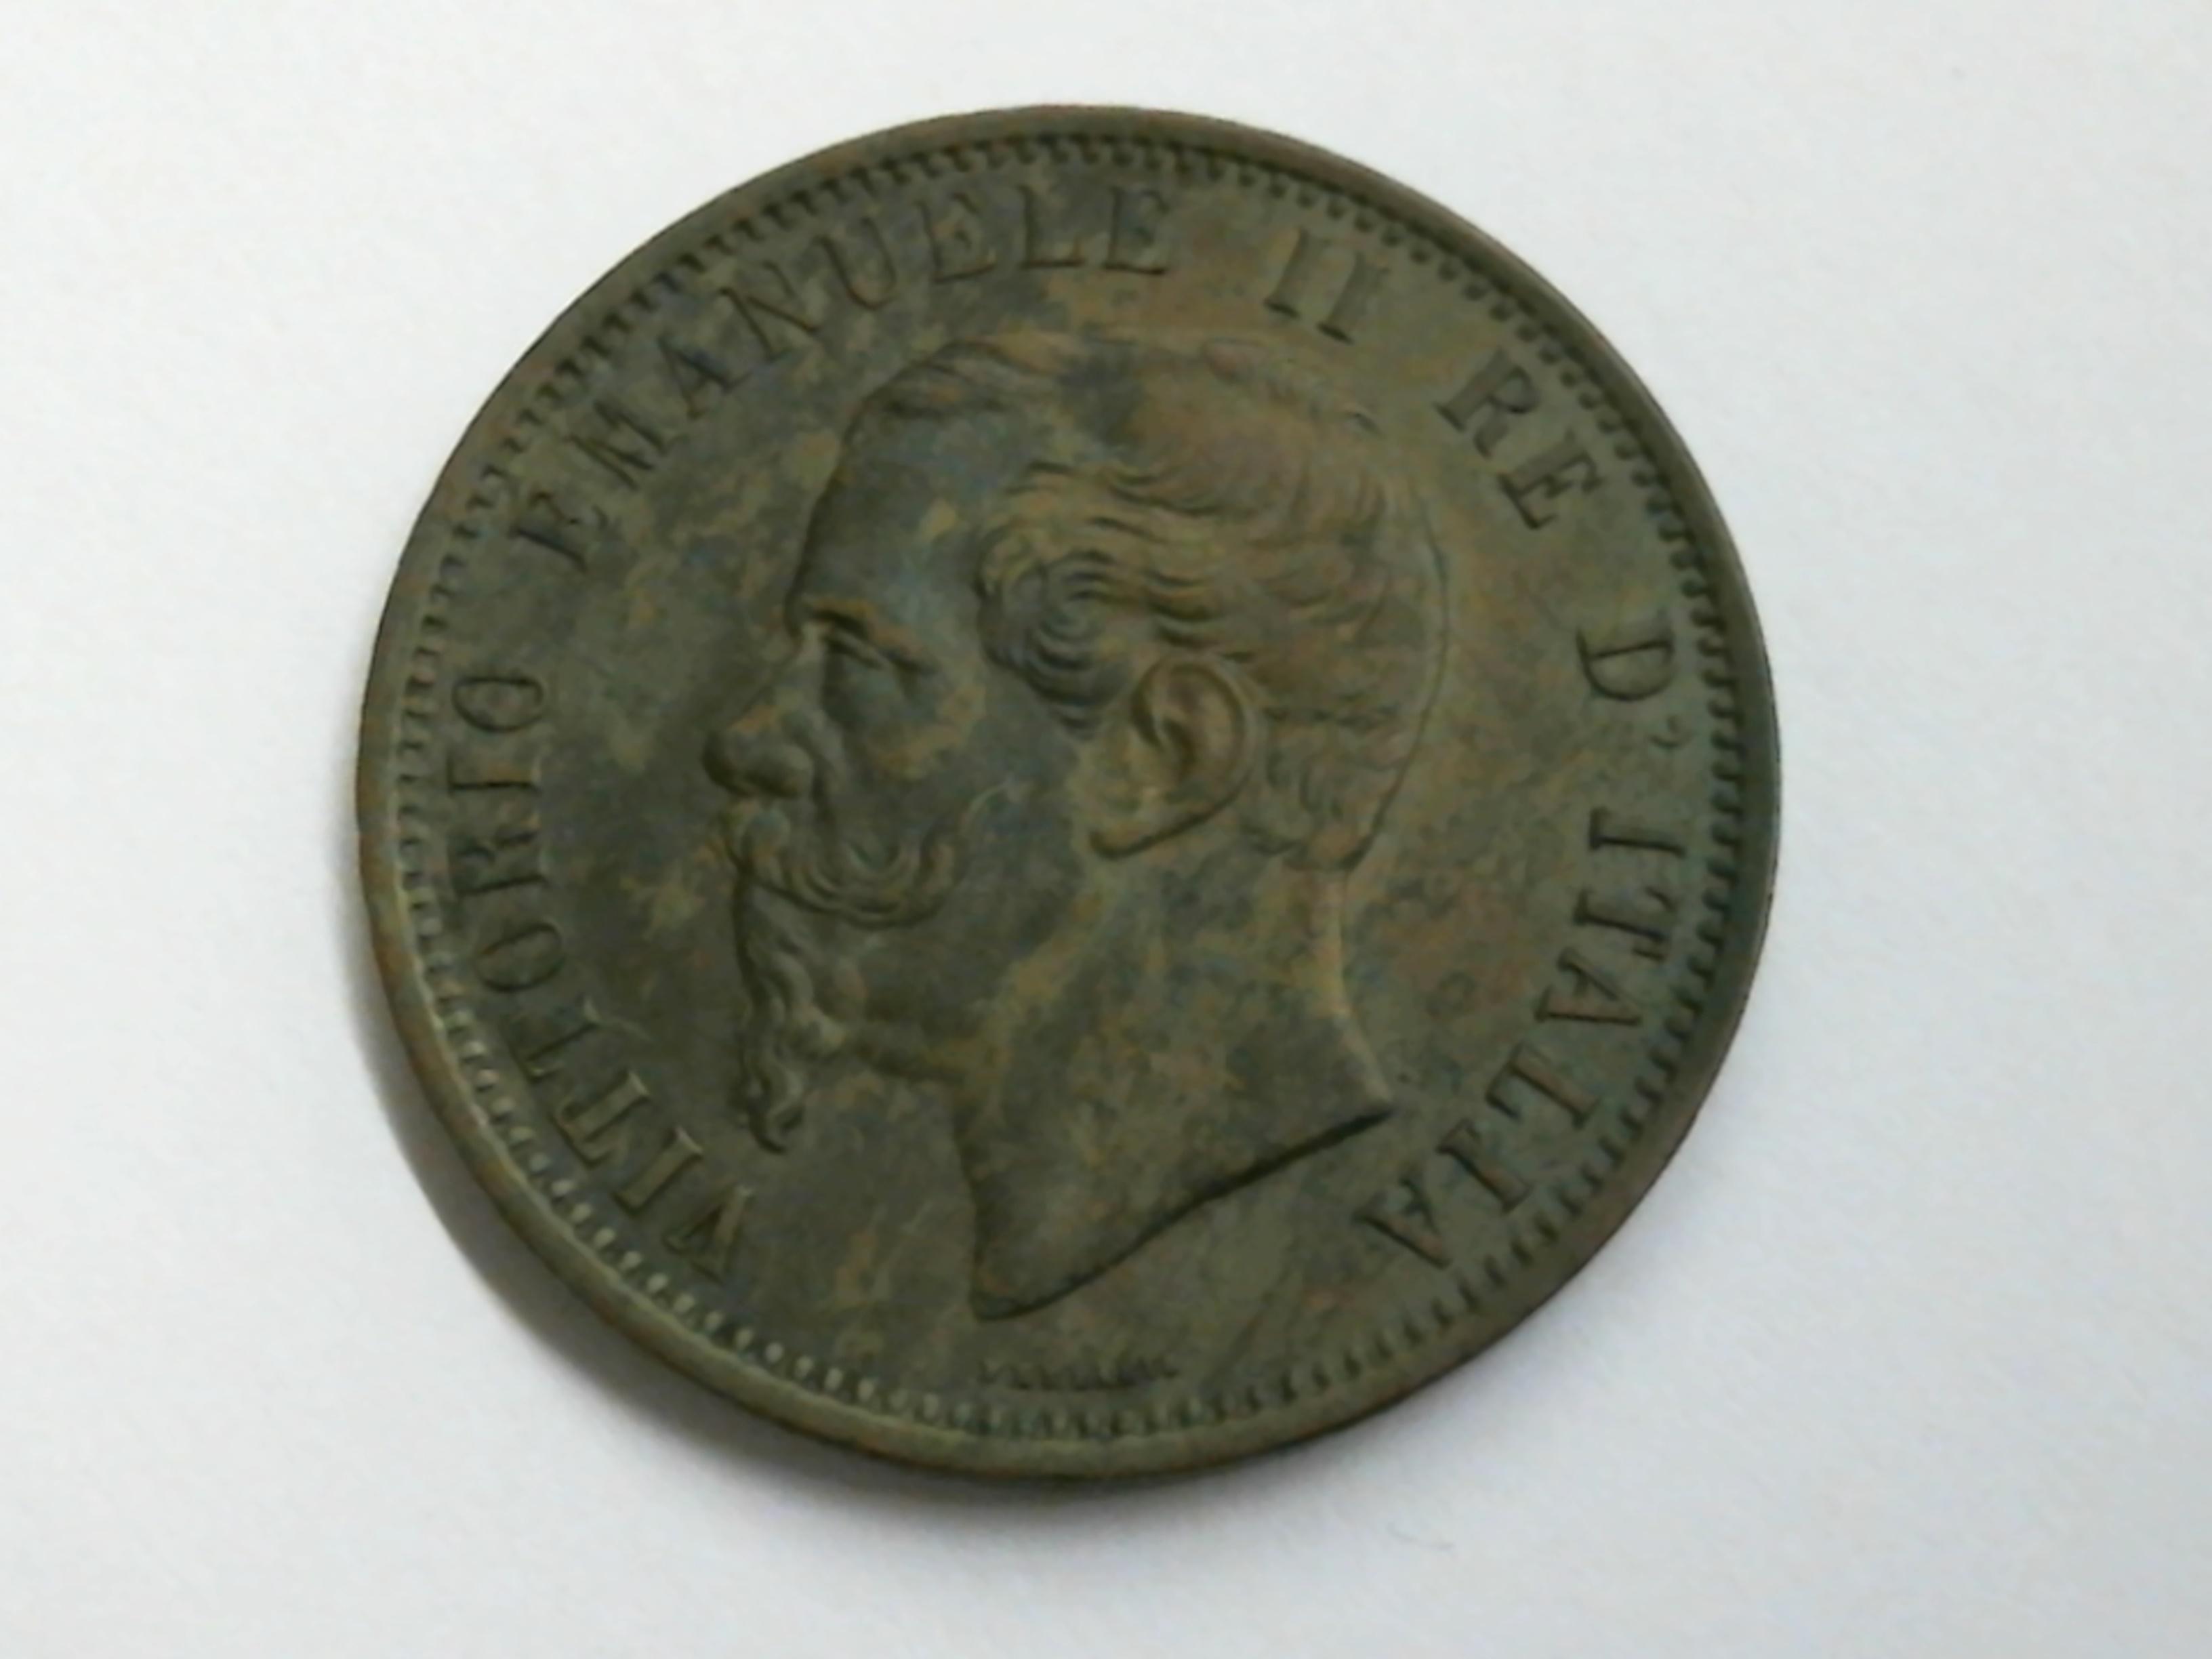 2ebf0eba49 10 Centesimi 1866 Milano - Numismatica Internazionale